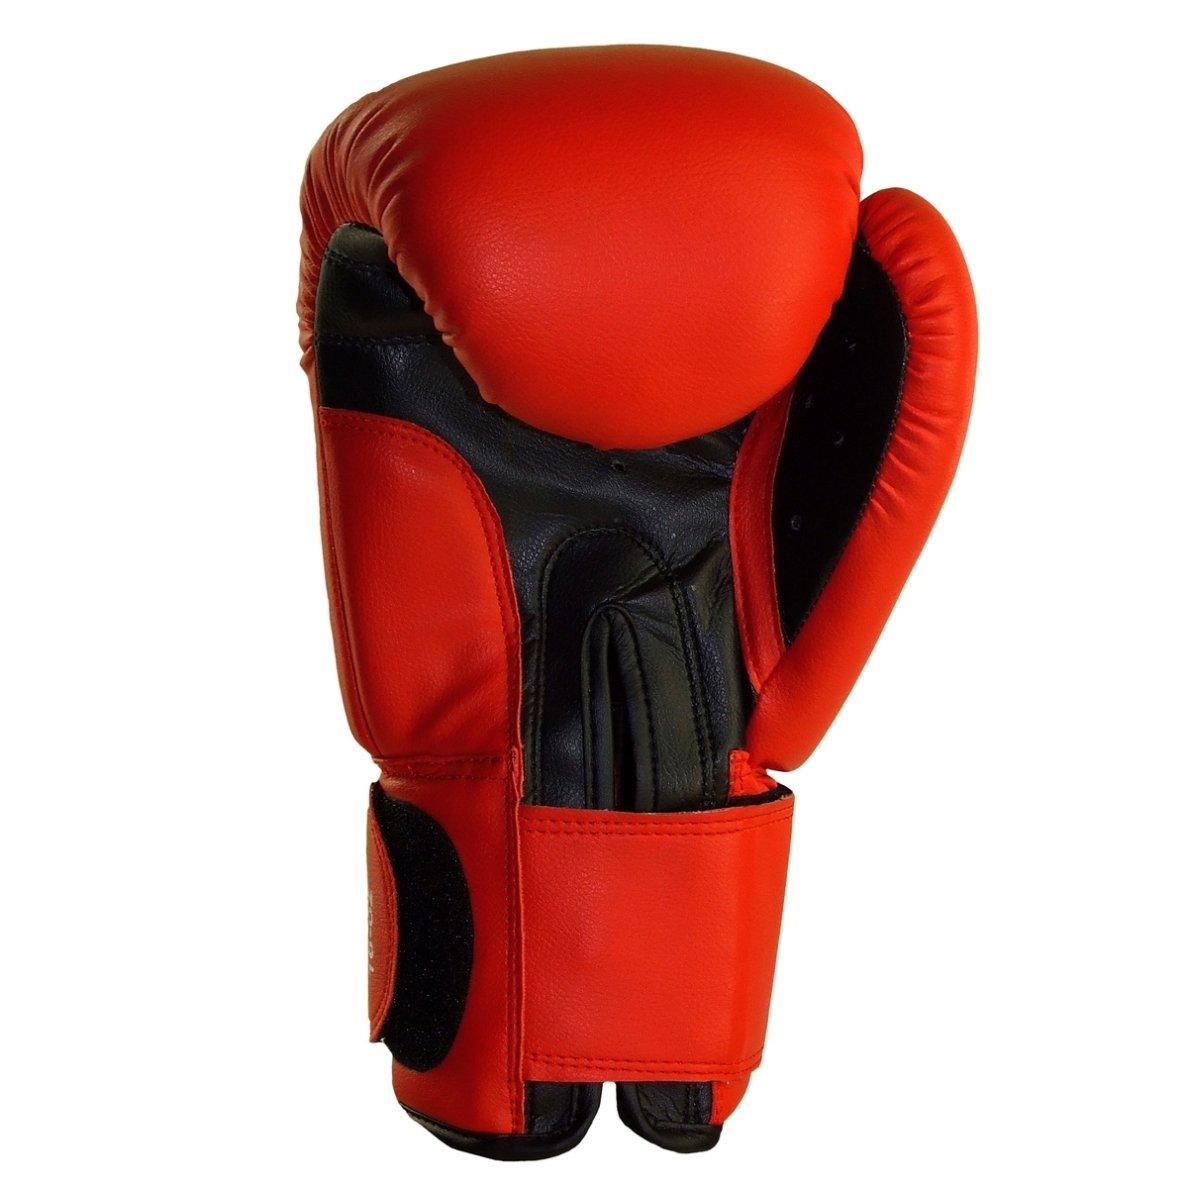 Kwon Clubline Azul Cuero Artificial Guantes De Boxeo 414ml Boxing, Martial Arts & Mma Sporting Goods